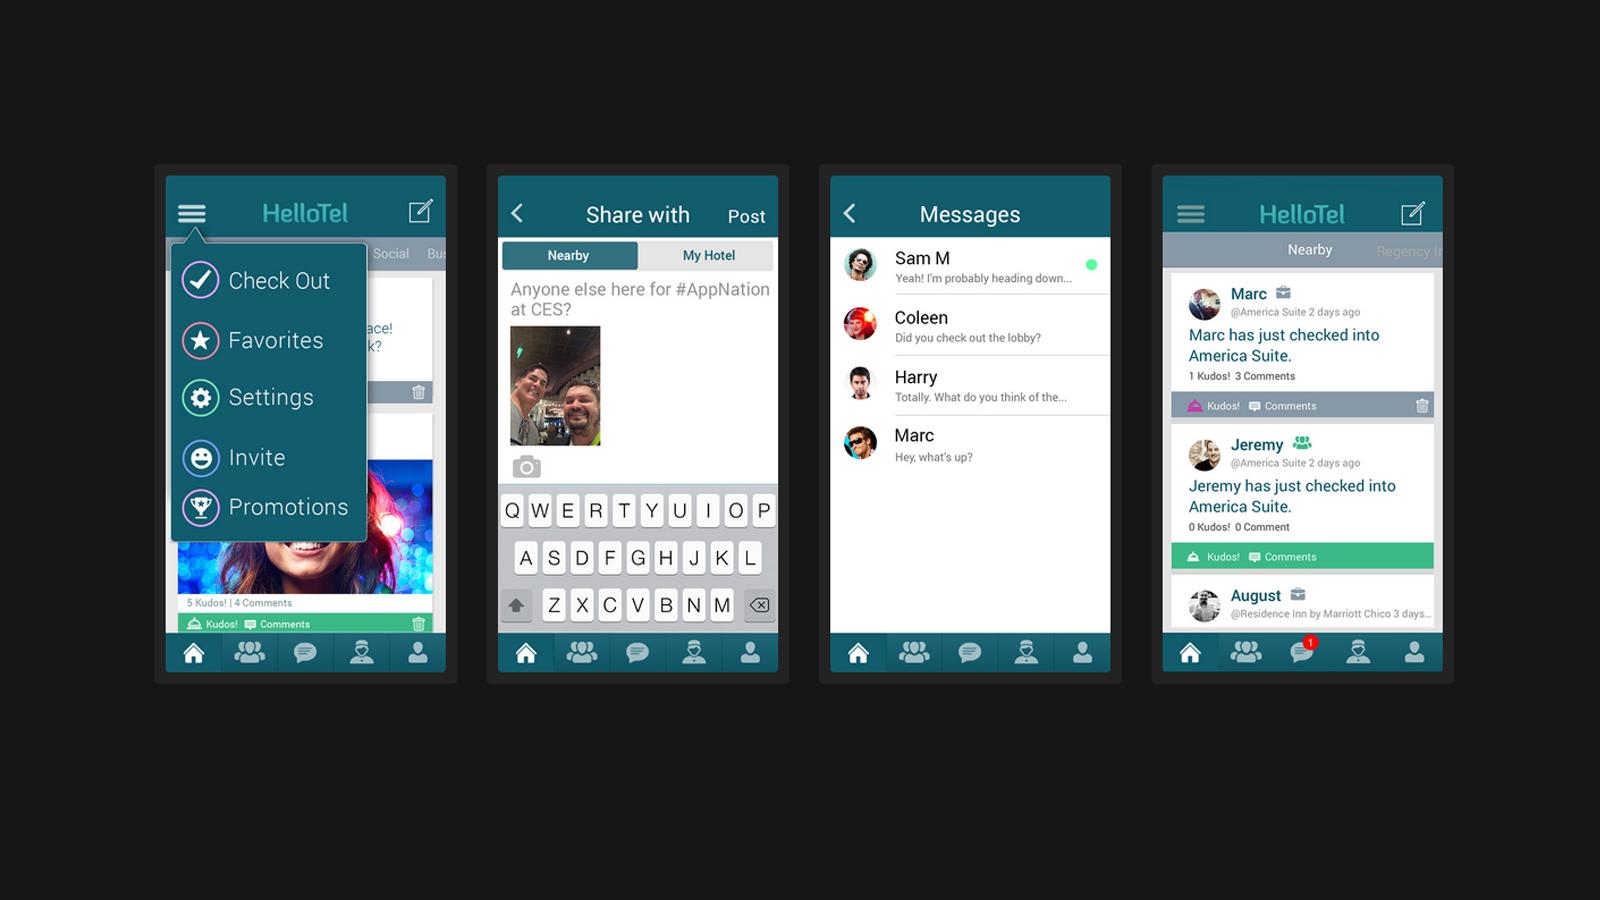 hookup app for business travelers